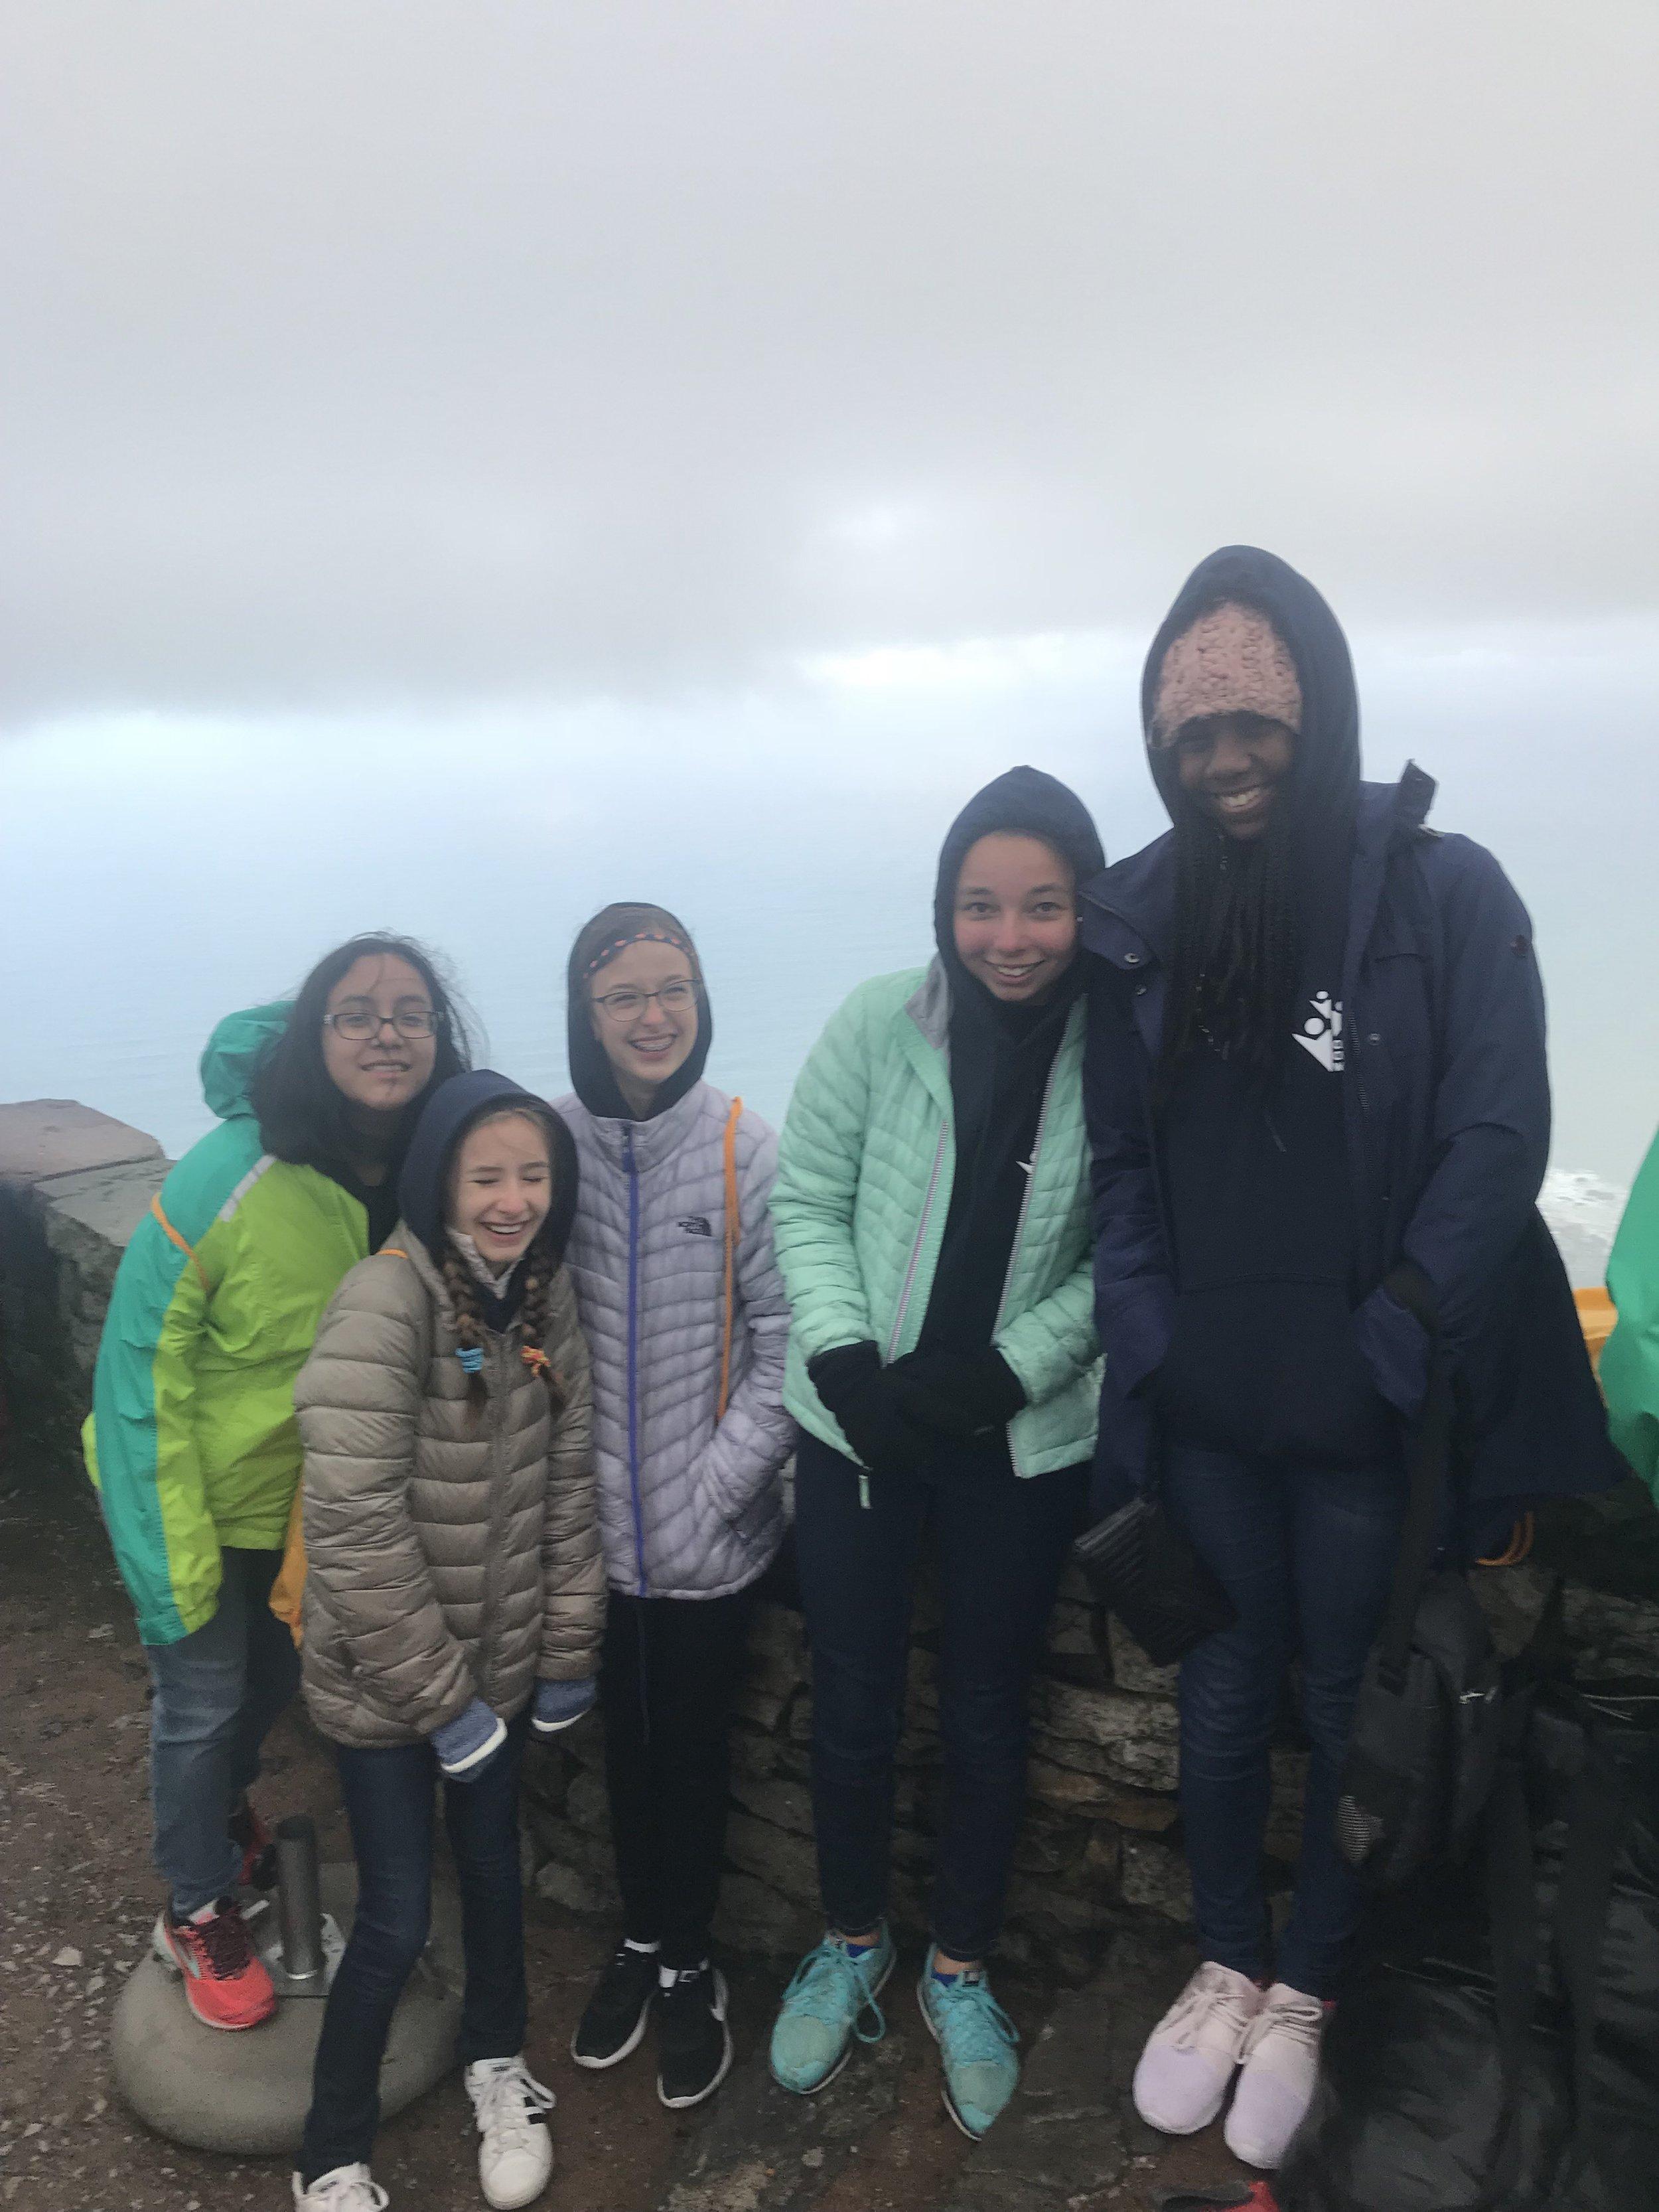 Table Mountain. Photo: Anita Gay